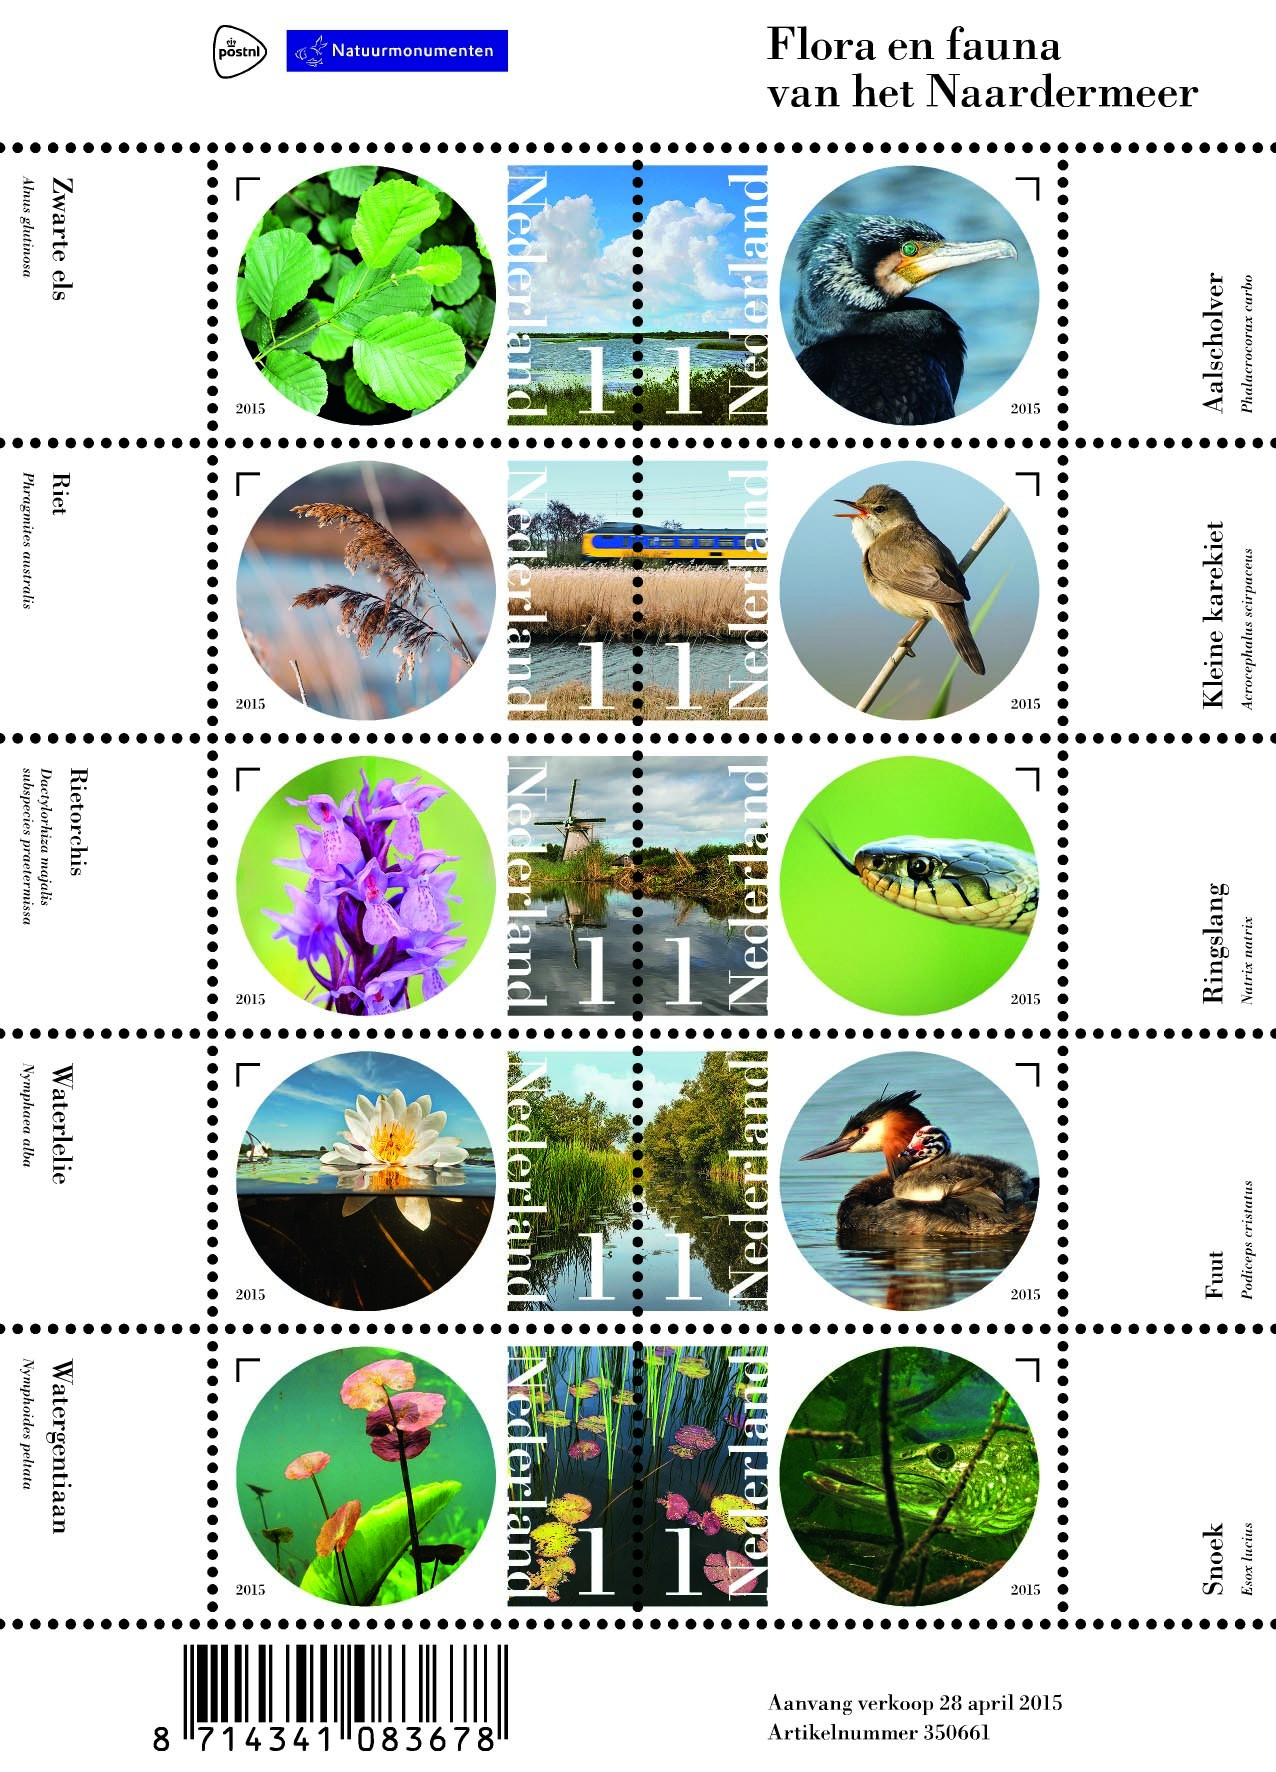 Flora en Fauna van het Noordermeer, te koop vanaf 28 april 2015